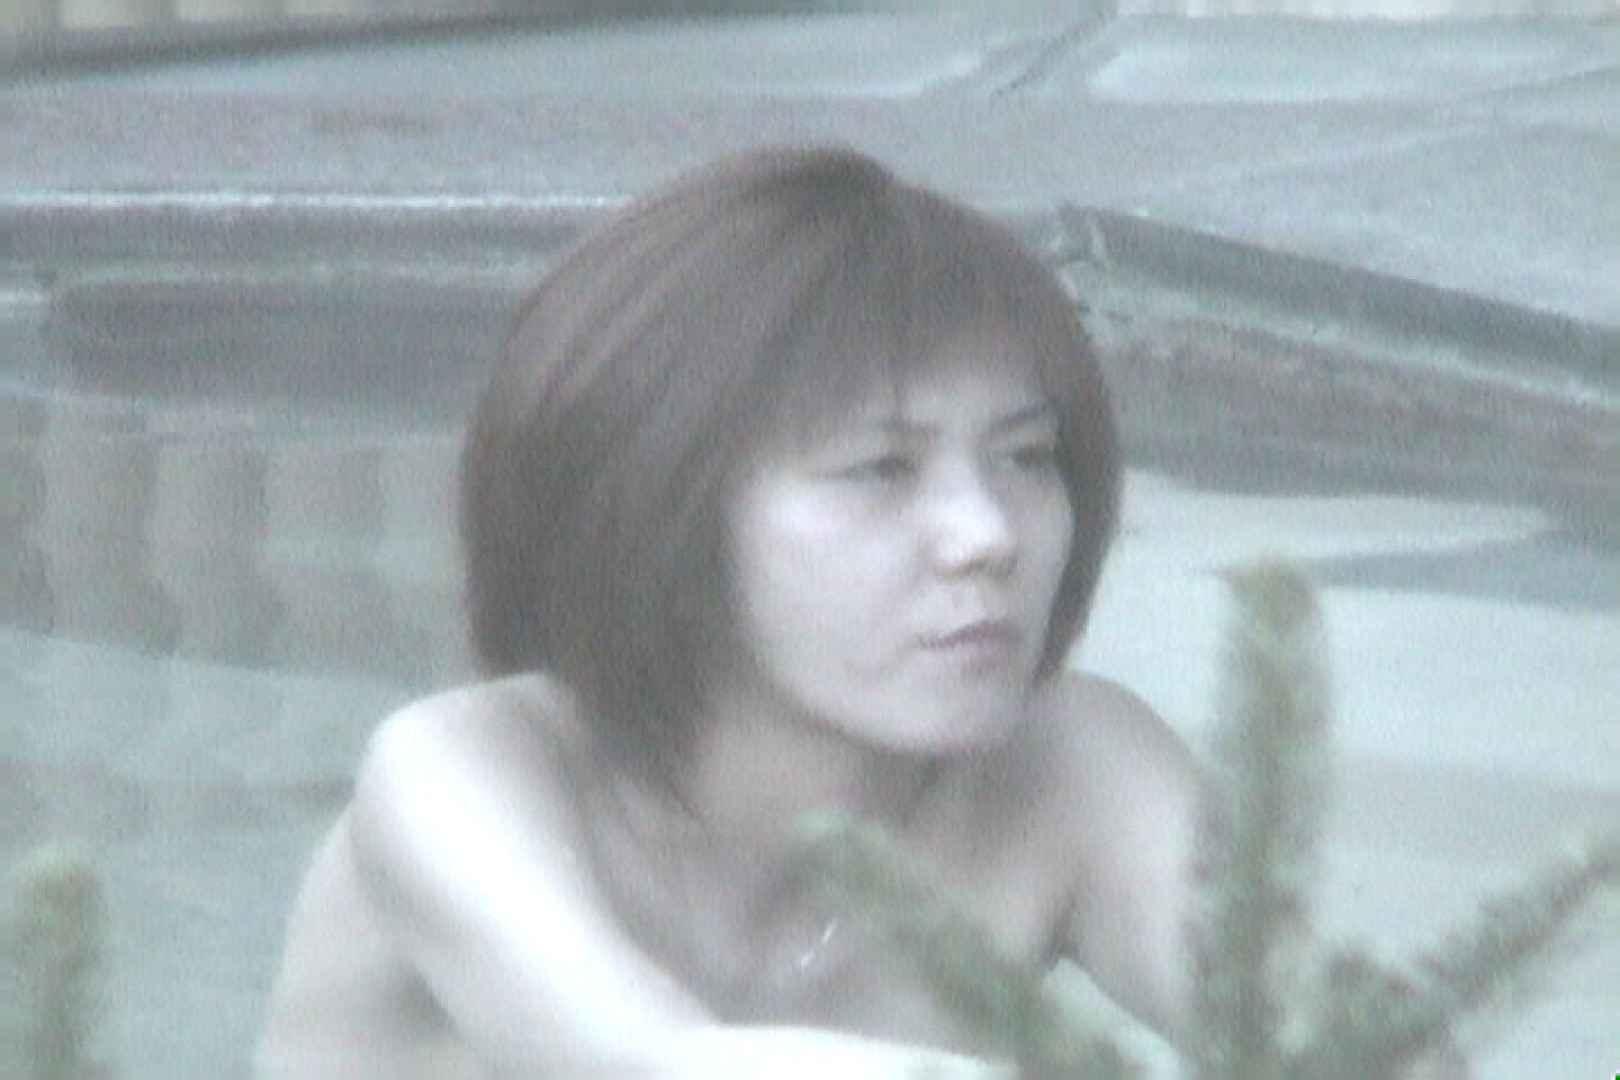 Aquaな露天風呂Vol.560 露天 | HなOL  62pic 45